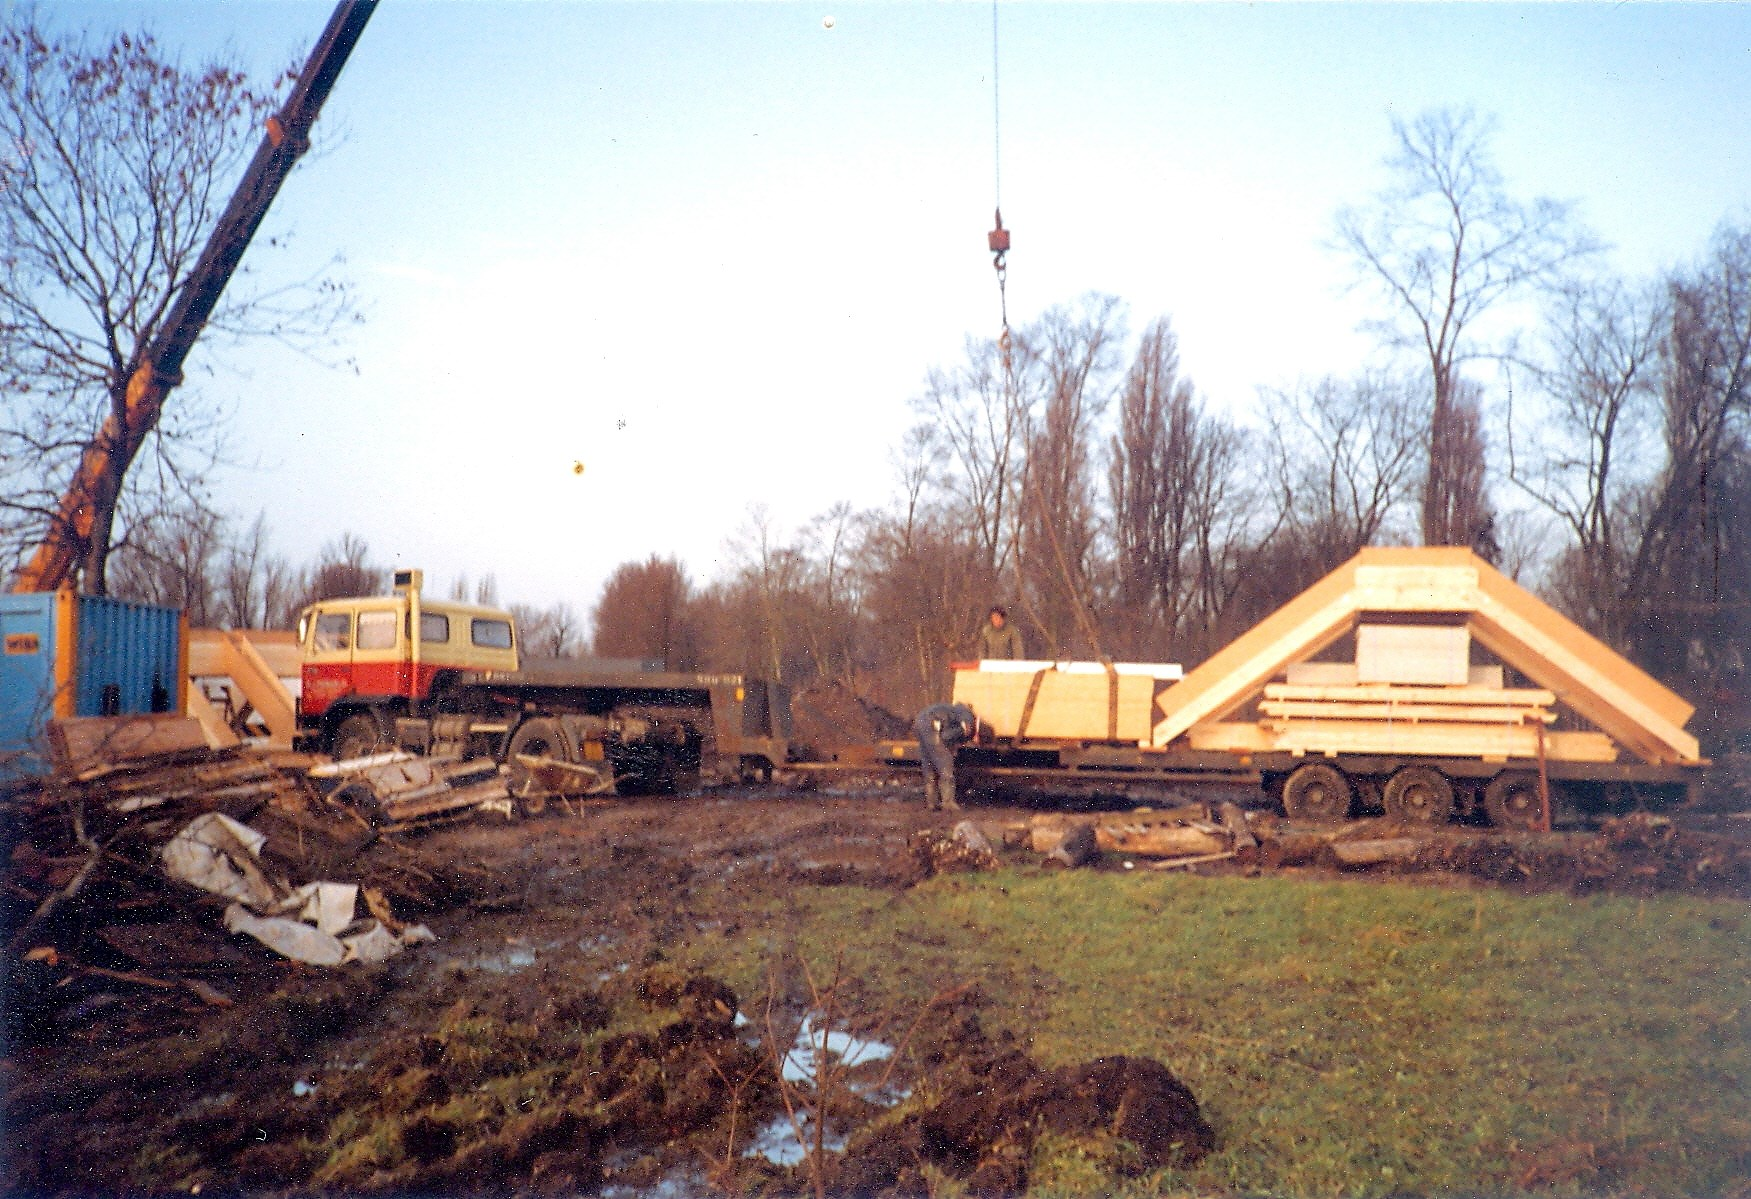 Dim-Geelhoed-1983-Plaswijckerpark-Hillegersberg--2